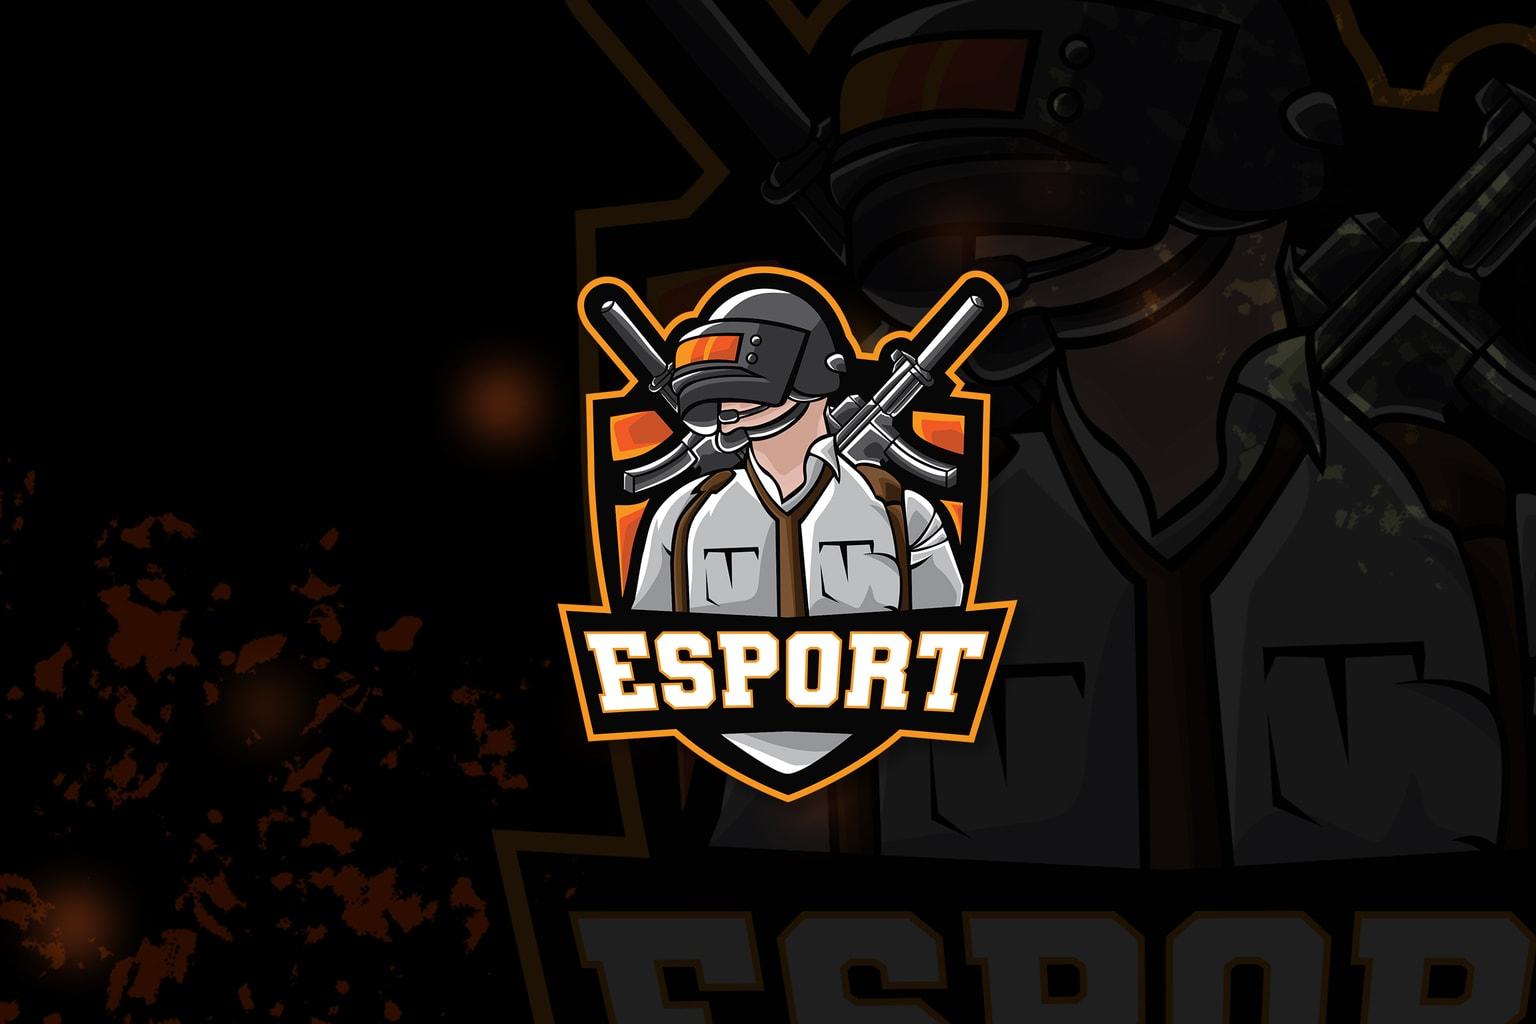 esport logo – special force